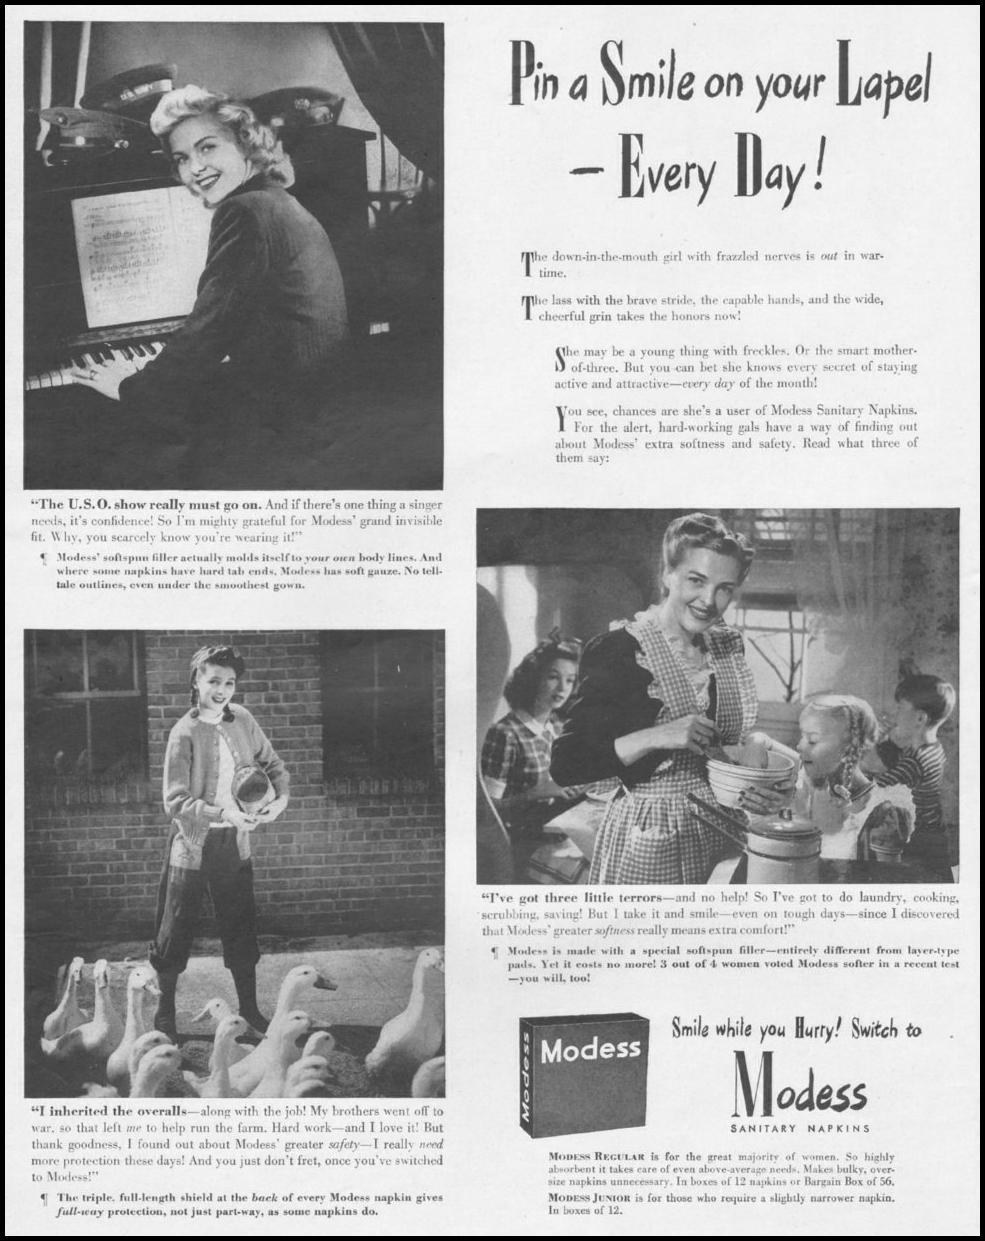 MODESS LIFE 10/25/1943 p. 80